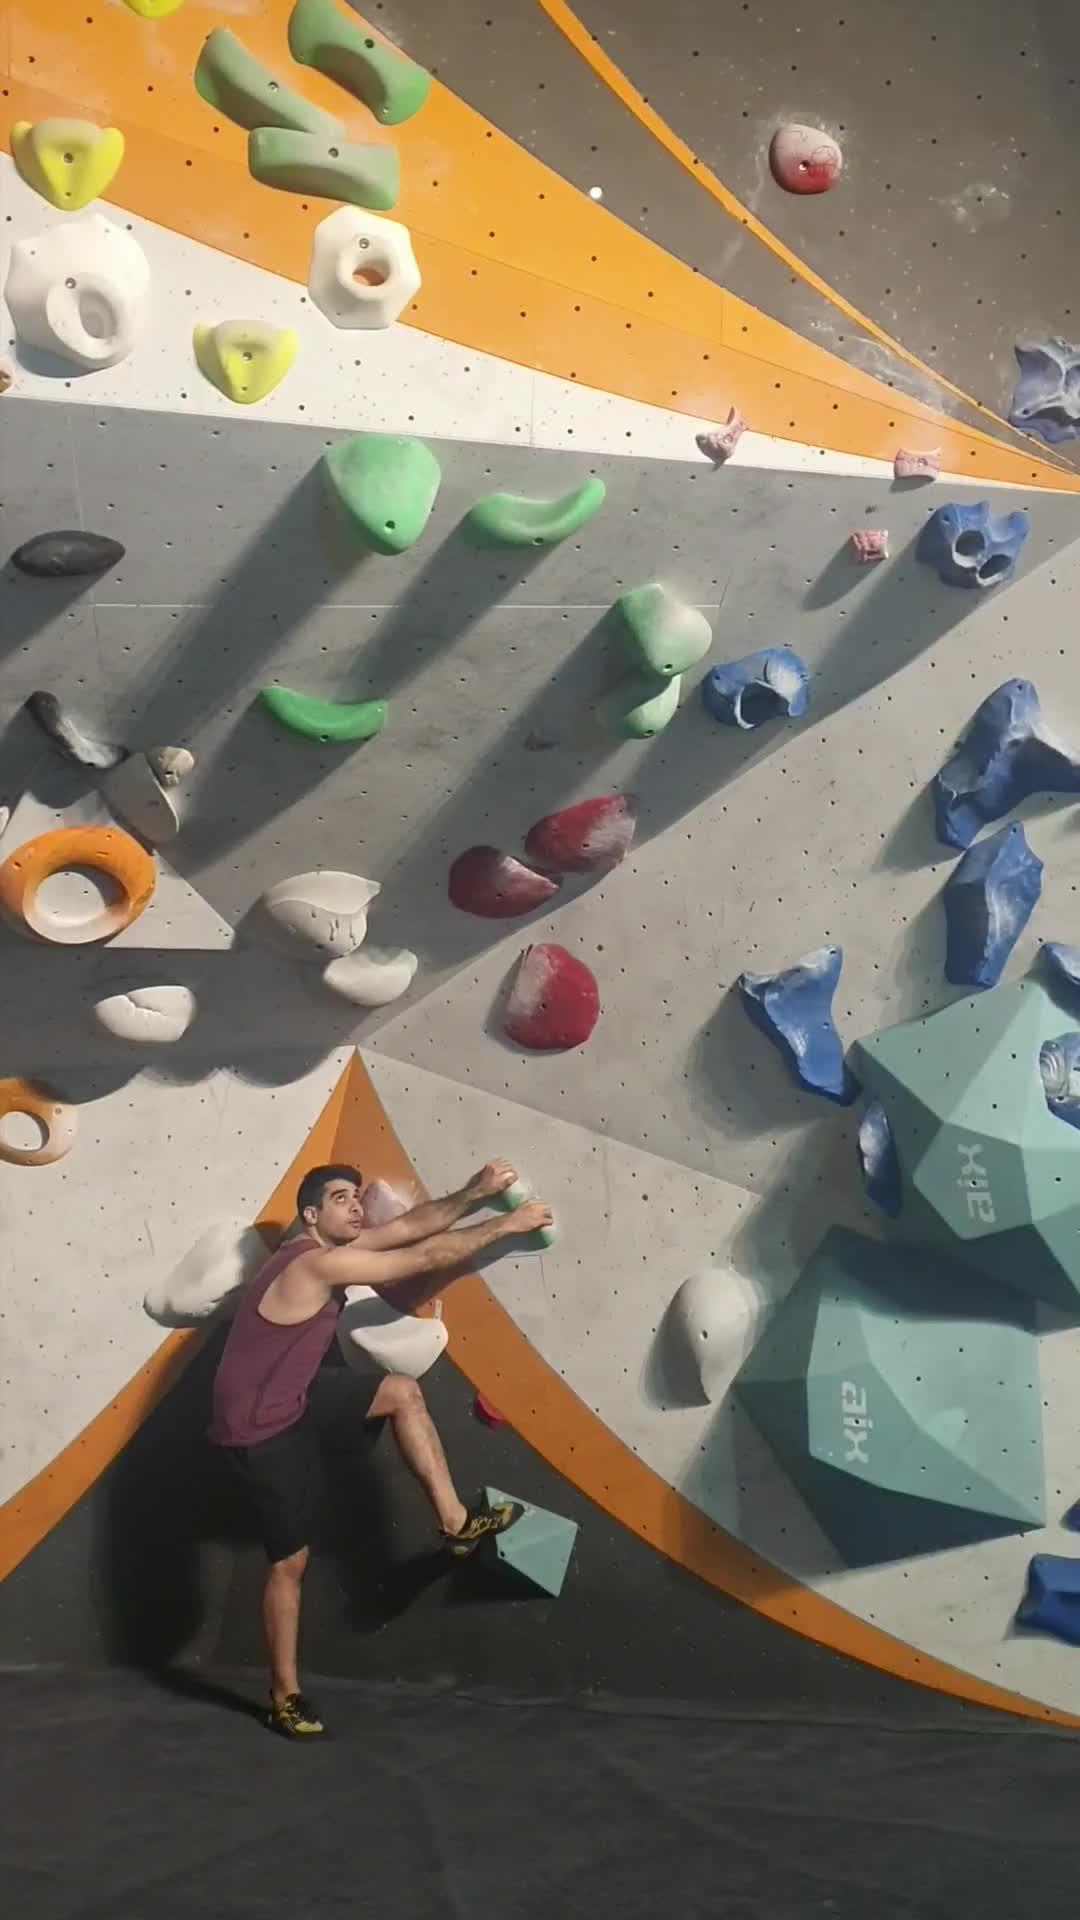 bouldering, rockclimbing, Fun dynamic boulder GIFs